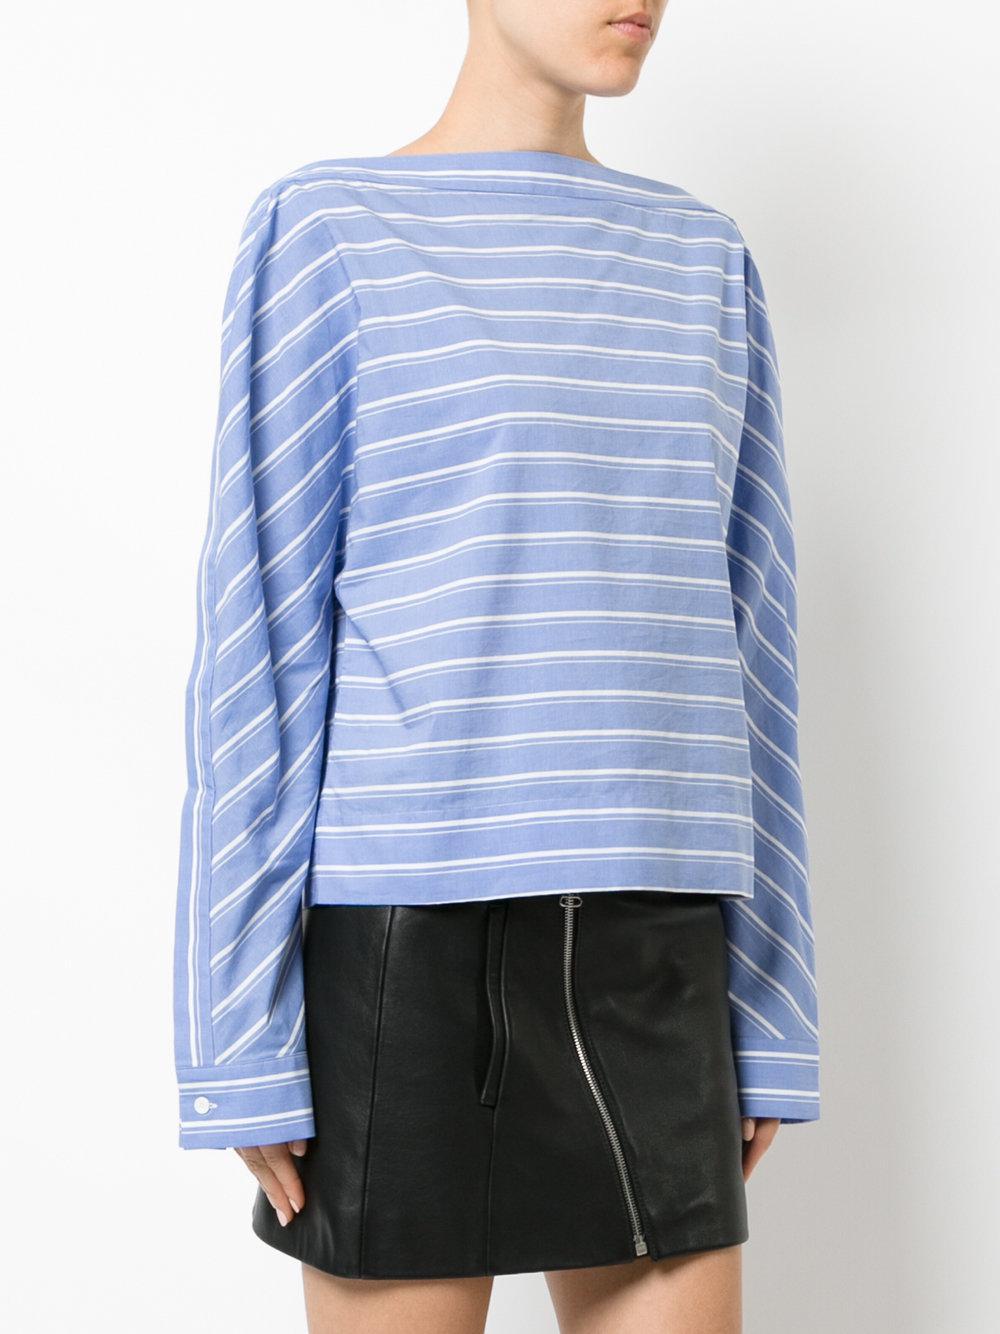 Cheap Sale Finishline Shopping Online For Sale paper towel T-shirt - Blue Dion Lee Discounts For Sale oZUFmuV